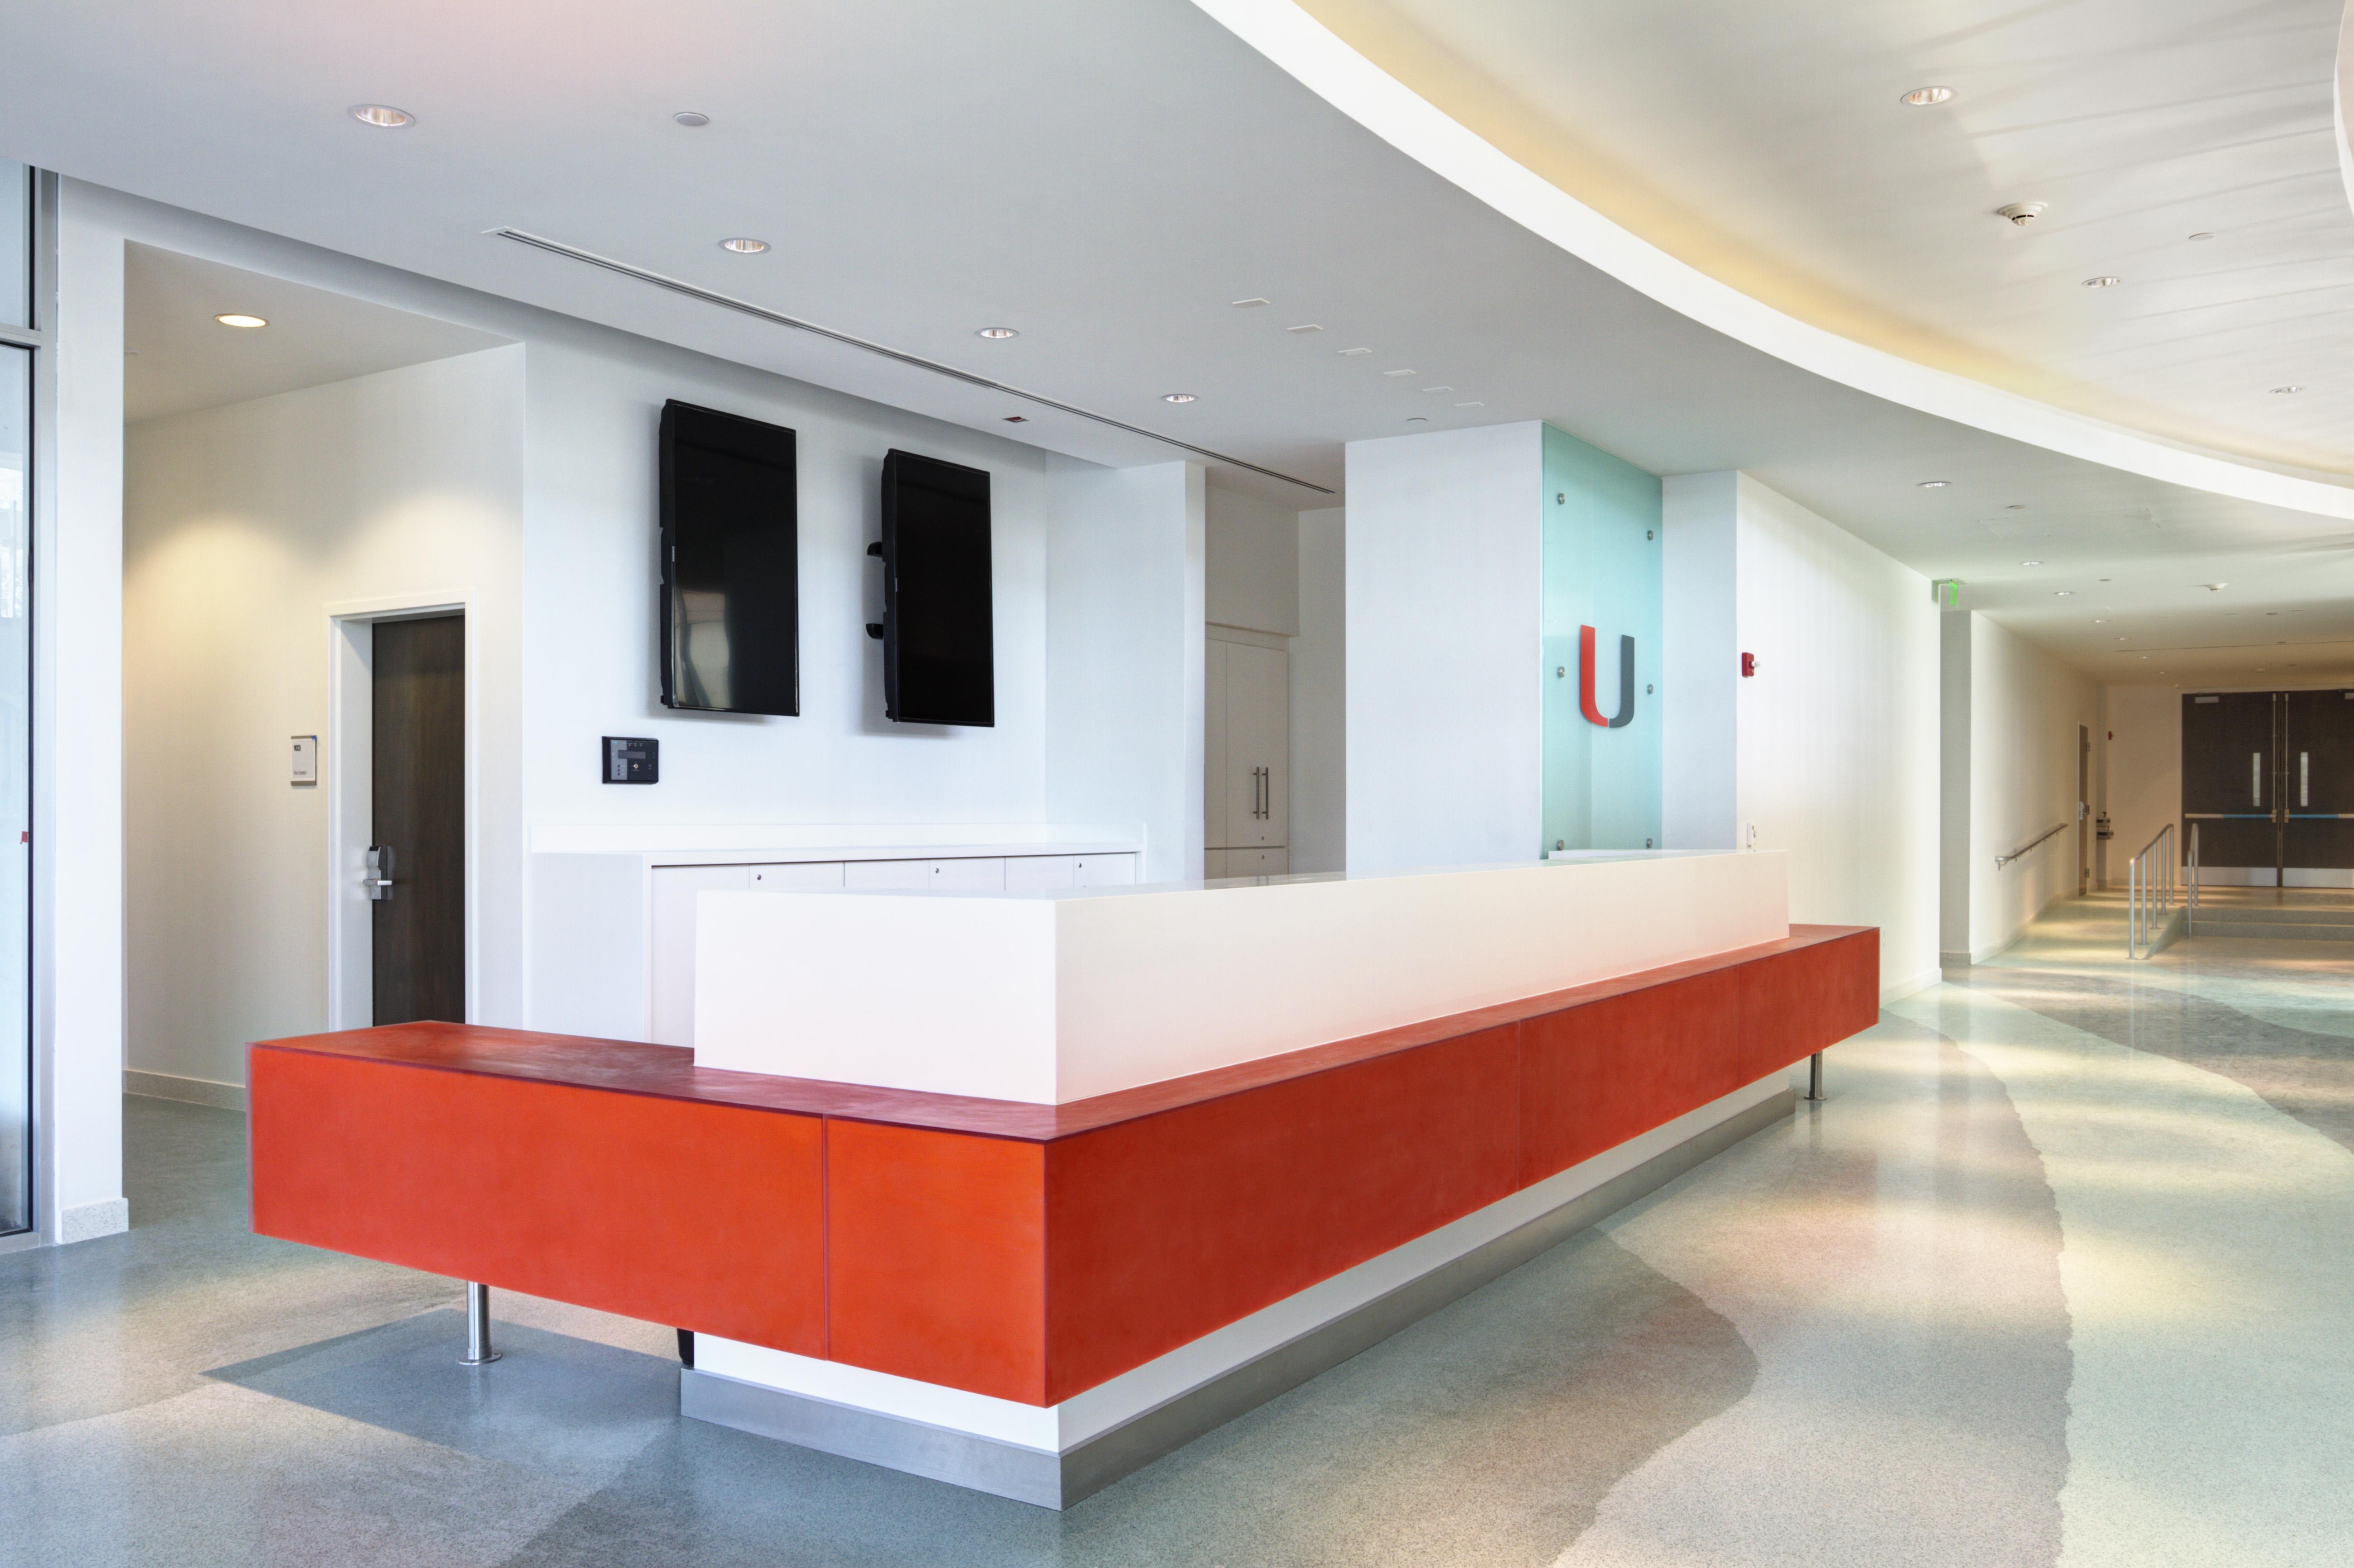 University of Miami – Student Activities Center 2